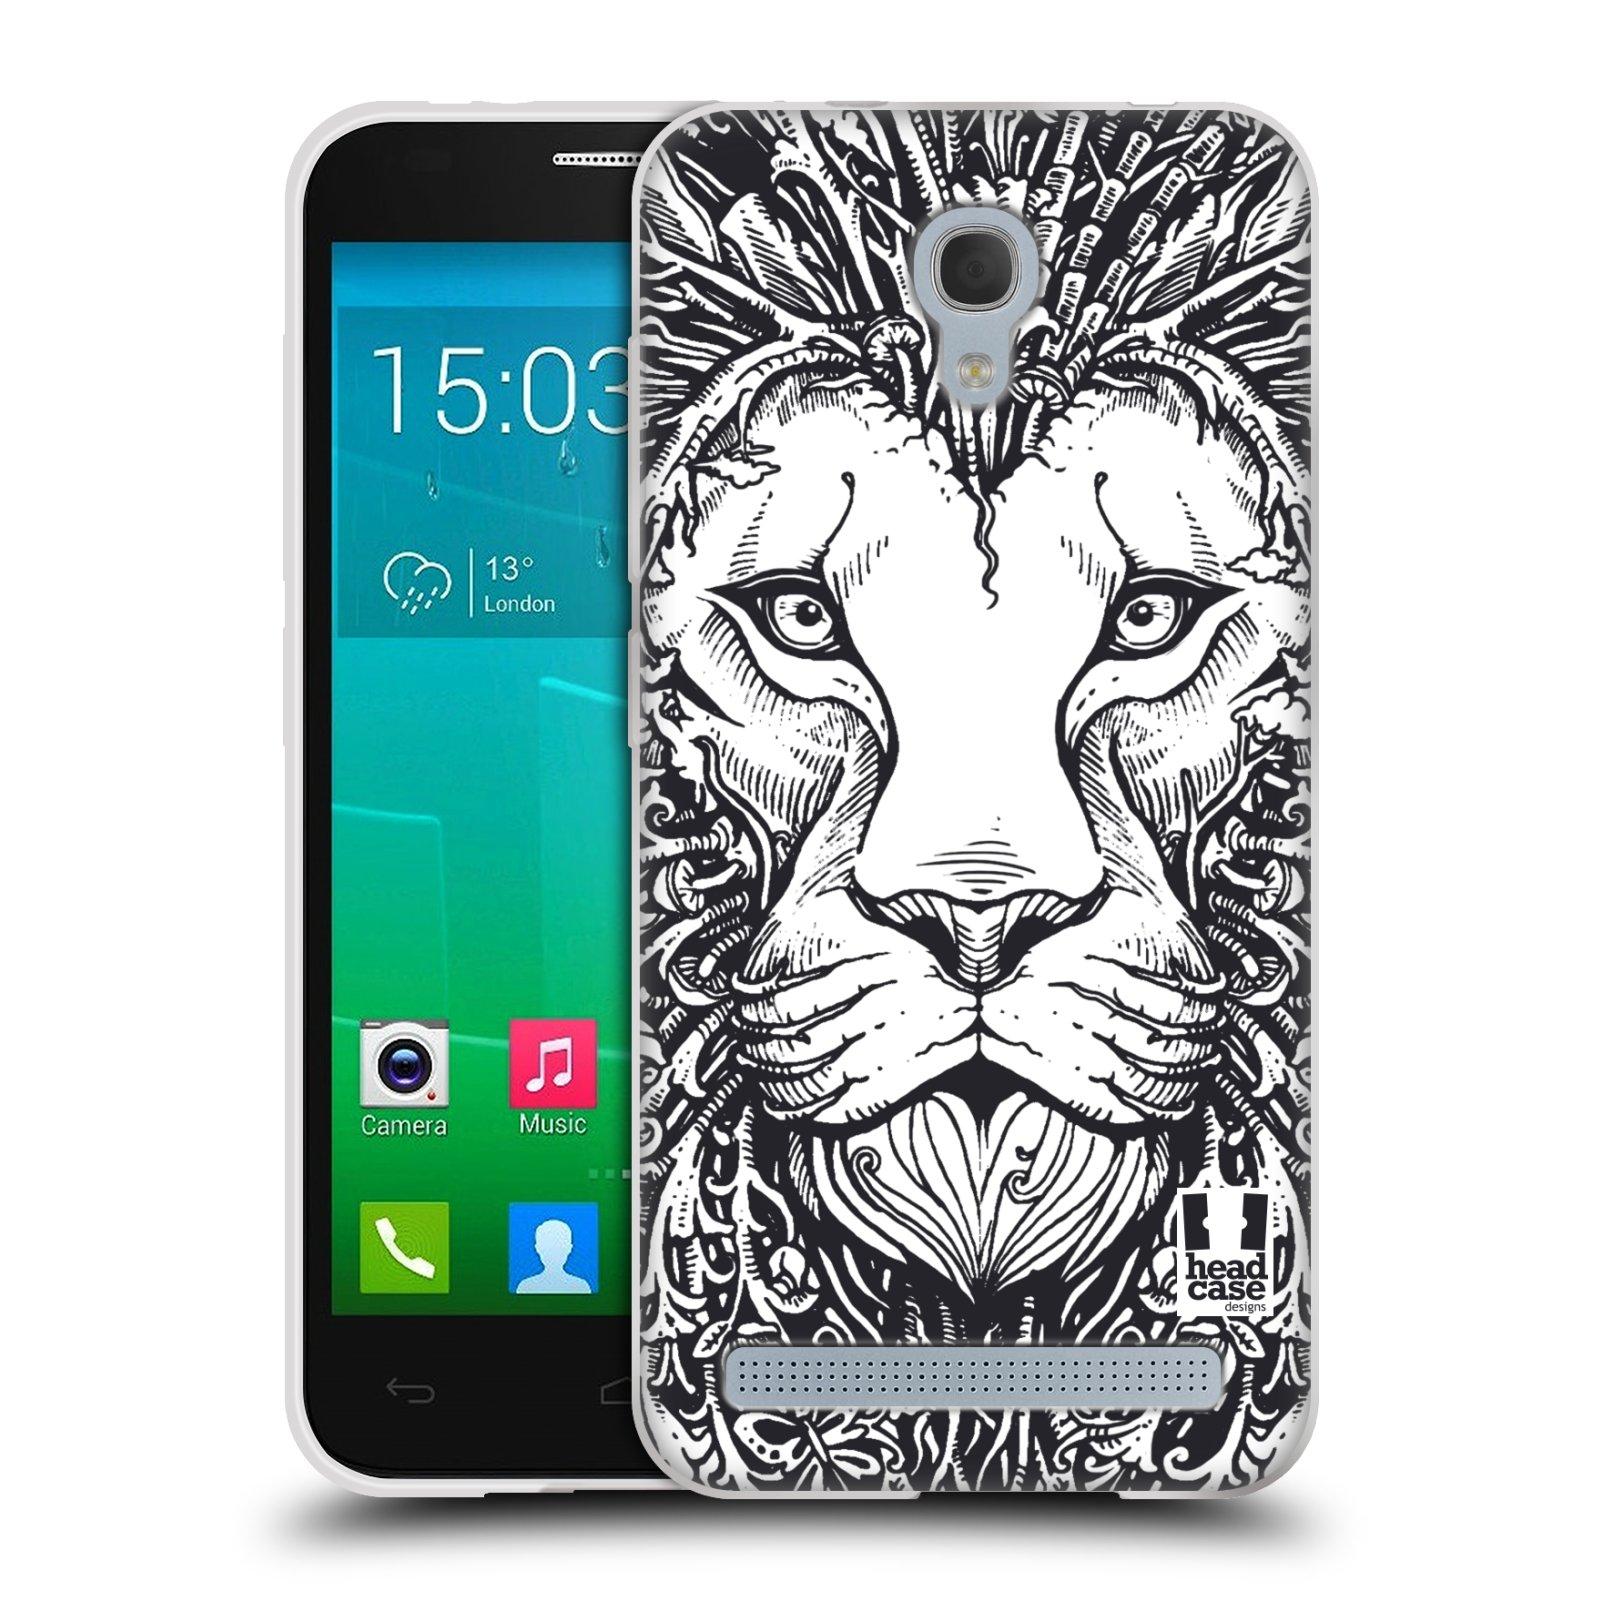 Silikonové pouzdro na mobil Alcatel One Touch Idol 2 Mini S 6036Y HEAD CASE DOODLE TVÁŘ LEV